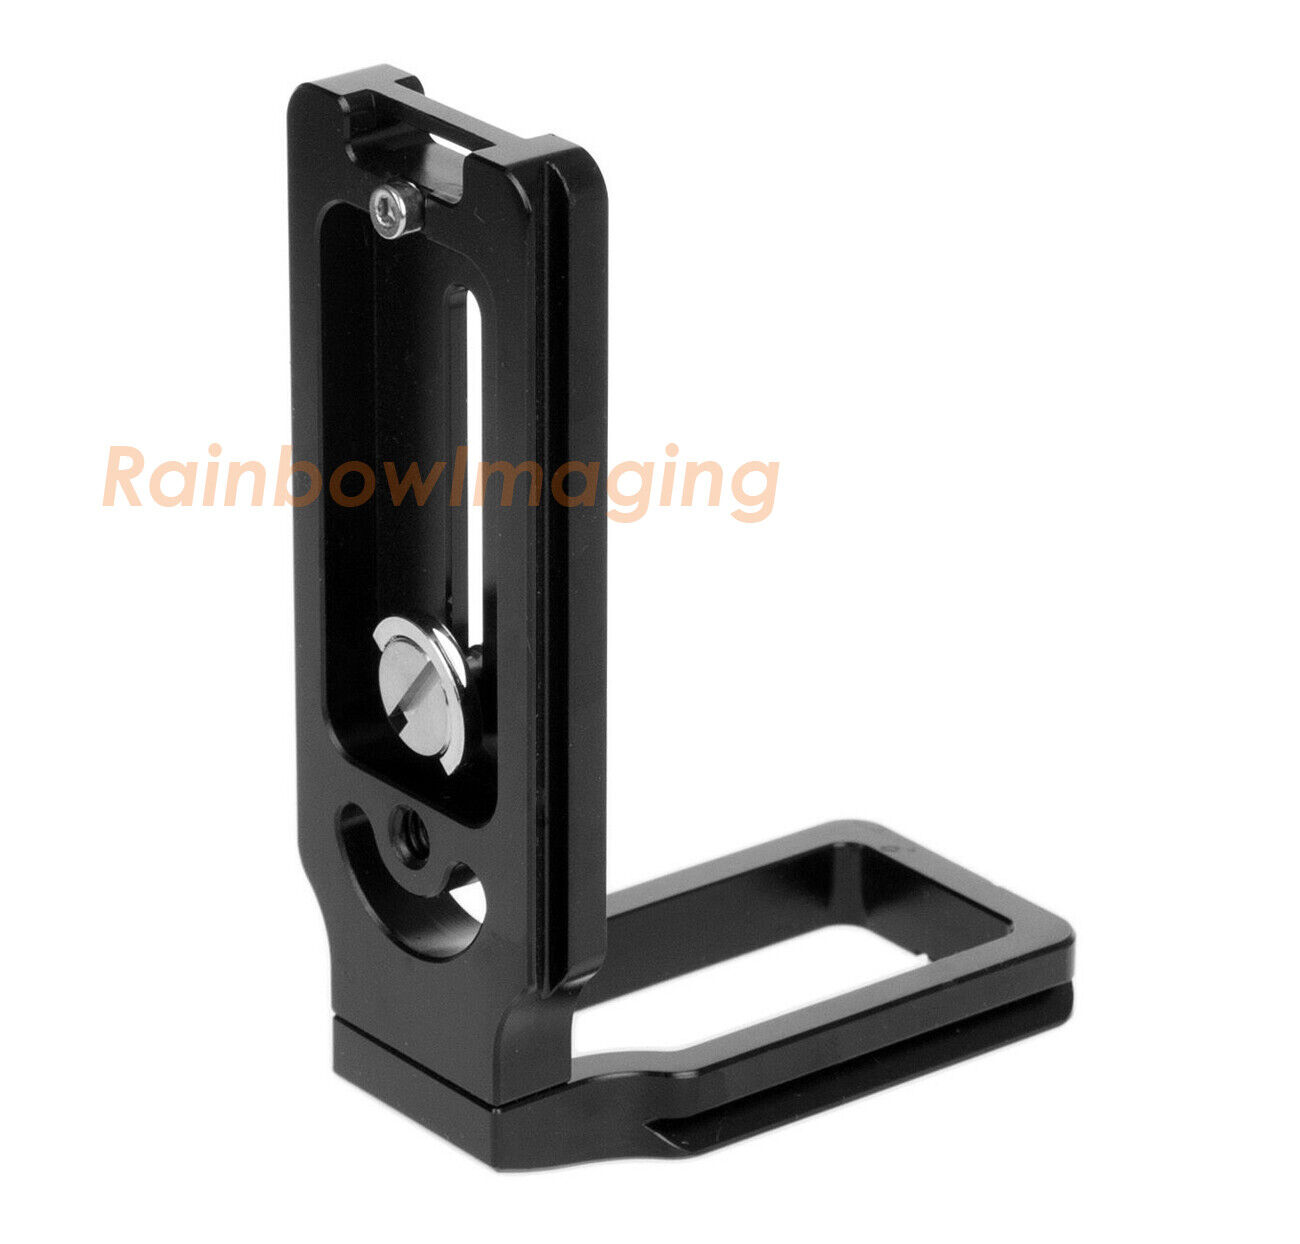 Gadget Place 1 Dimension Focusing Rail for Pentax K-S2 K-S1 K-3 K-50 K-500